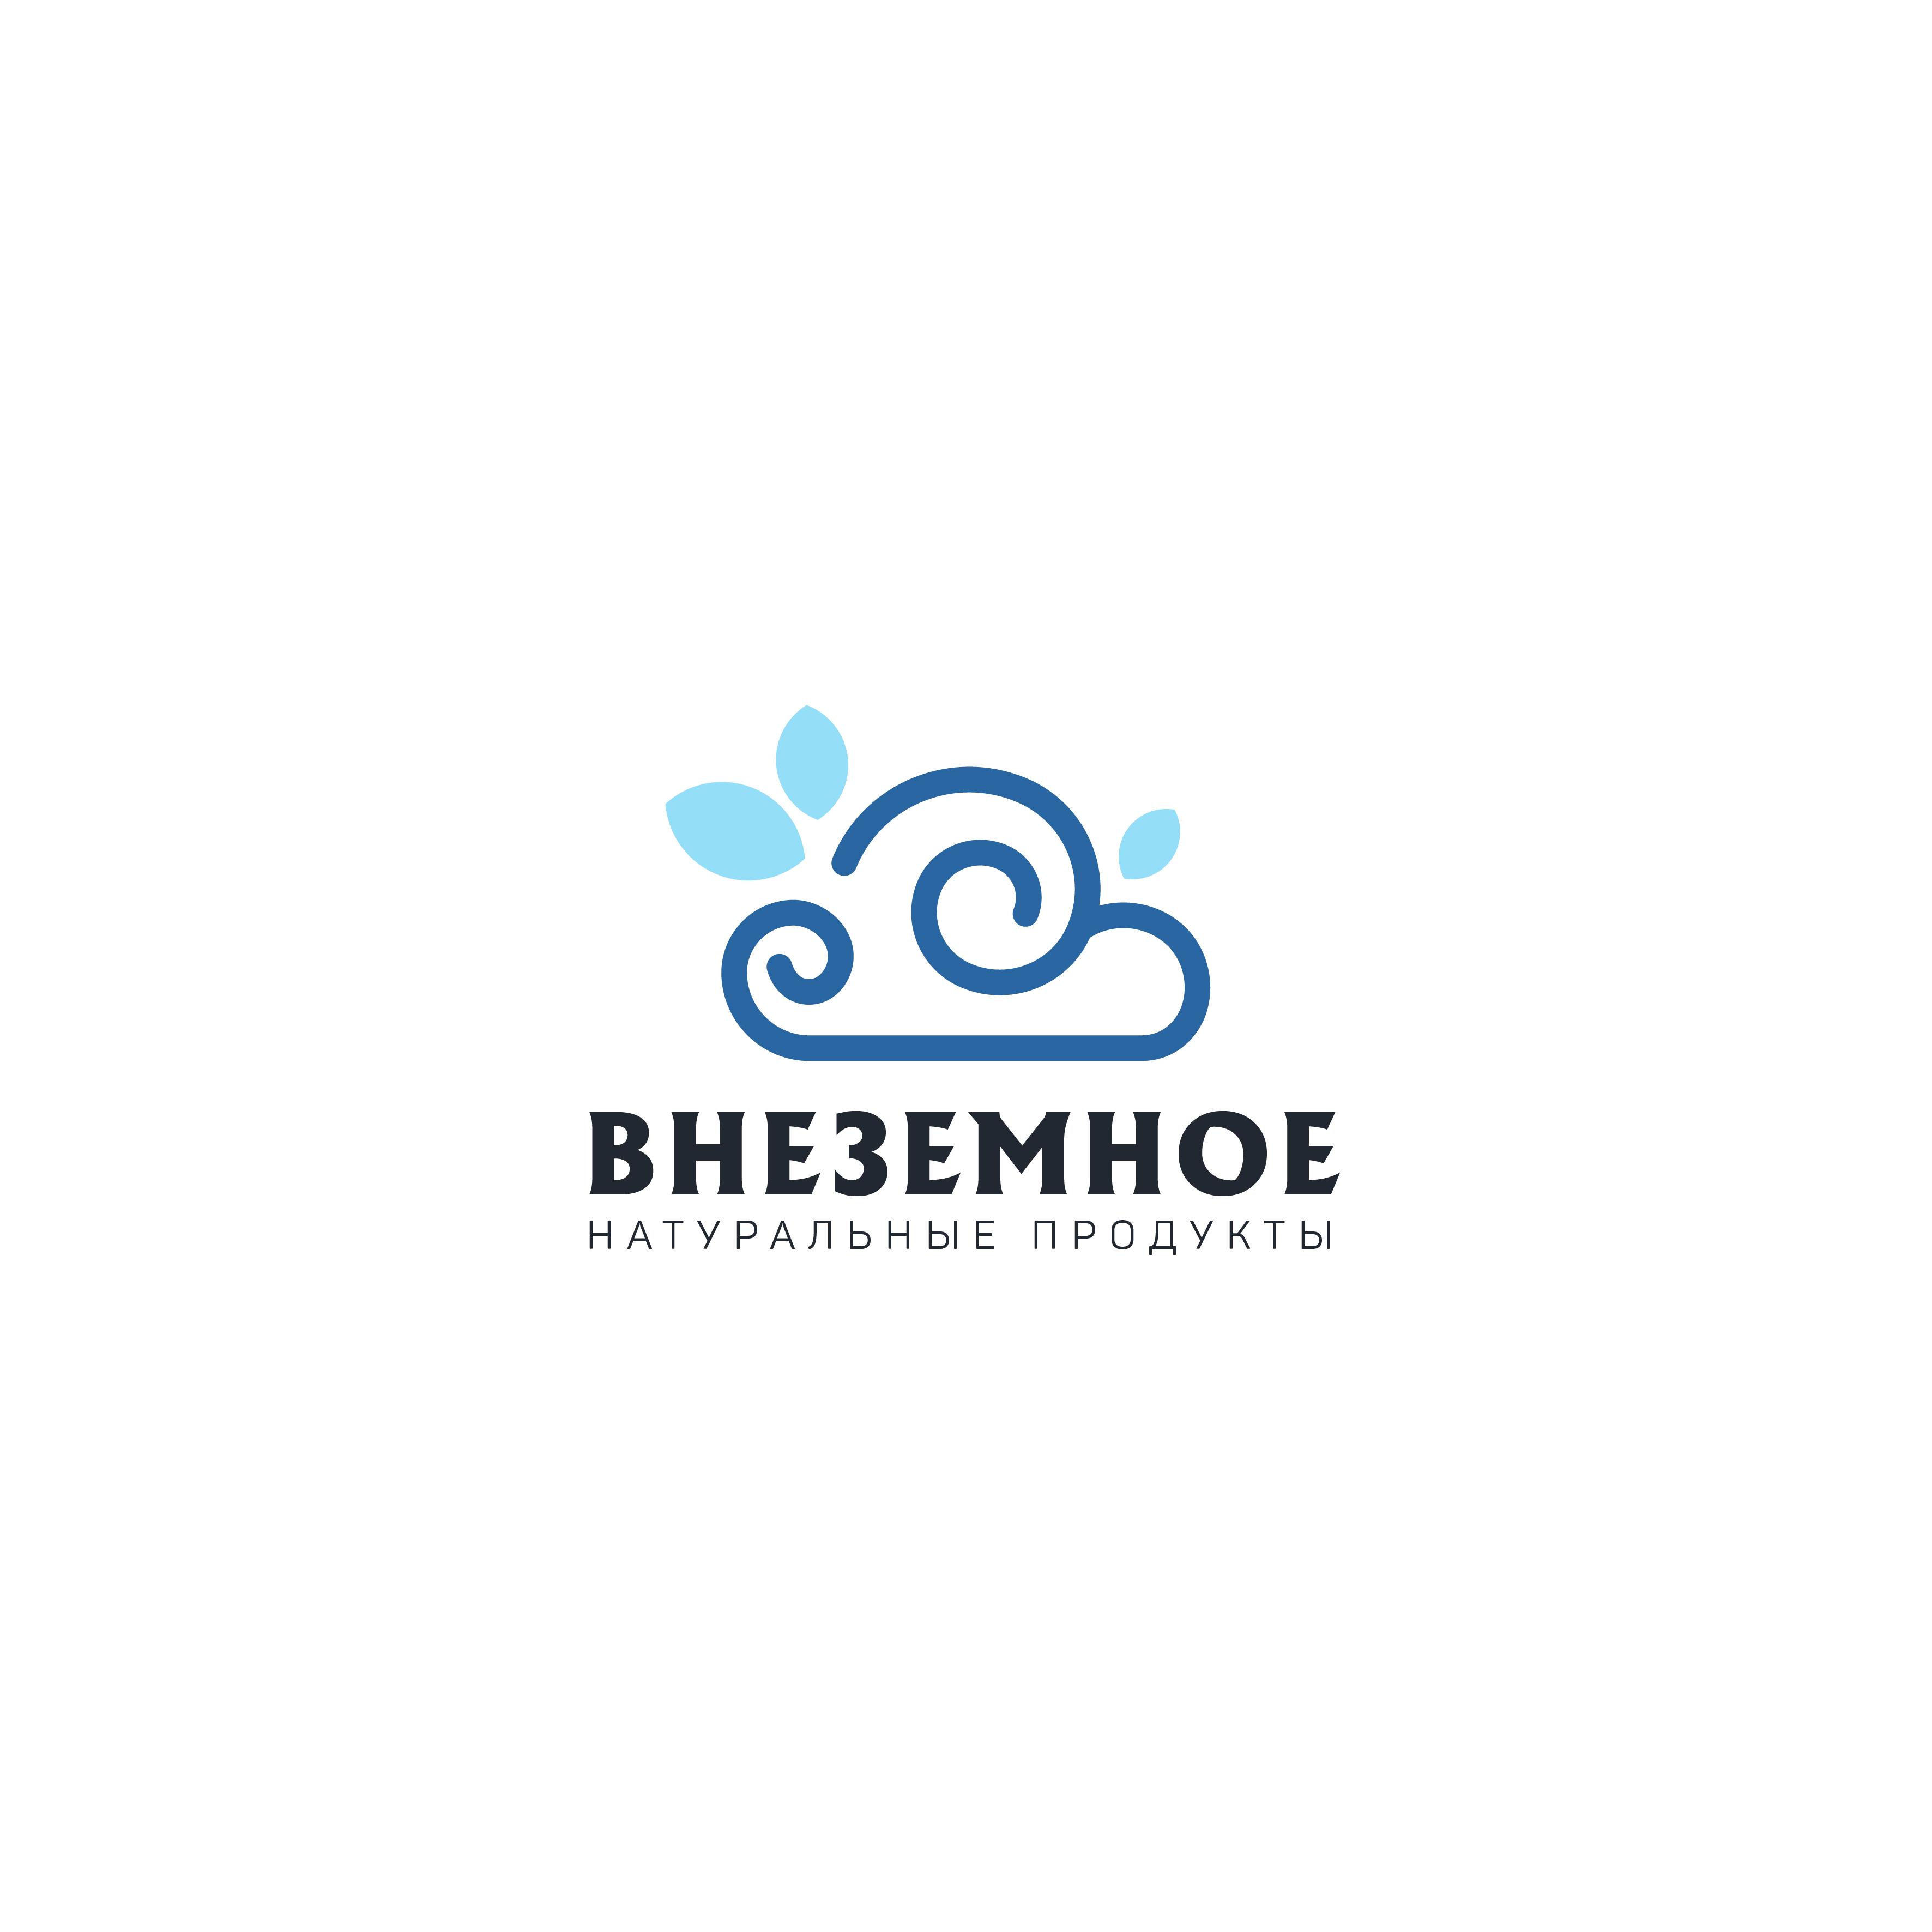 "Логотип и фирменный стиль ""Внеземное"" фото f_8145e74872c3d97a.jpg"